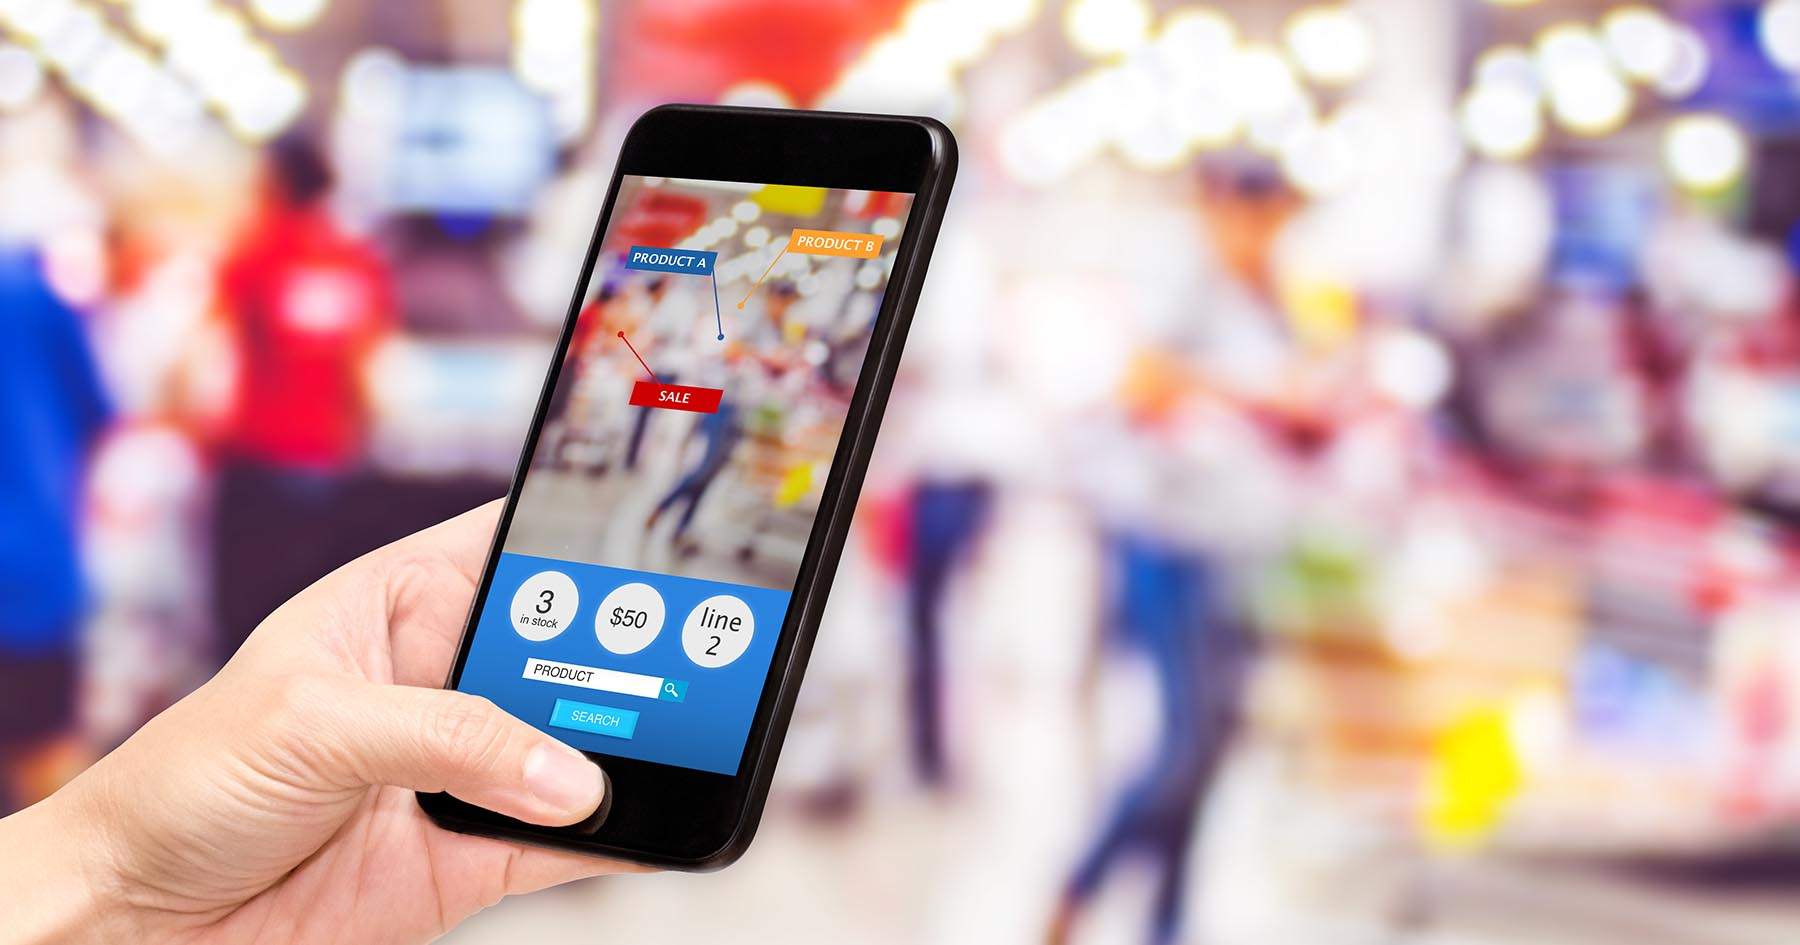 Wakefern Food Corp  Announces $13 6 Billion in Retail Sales